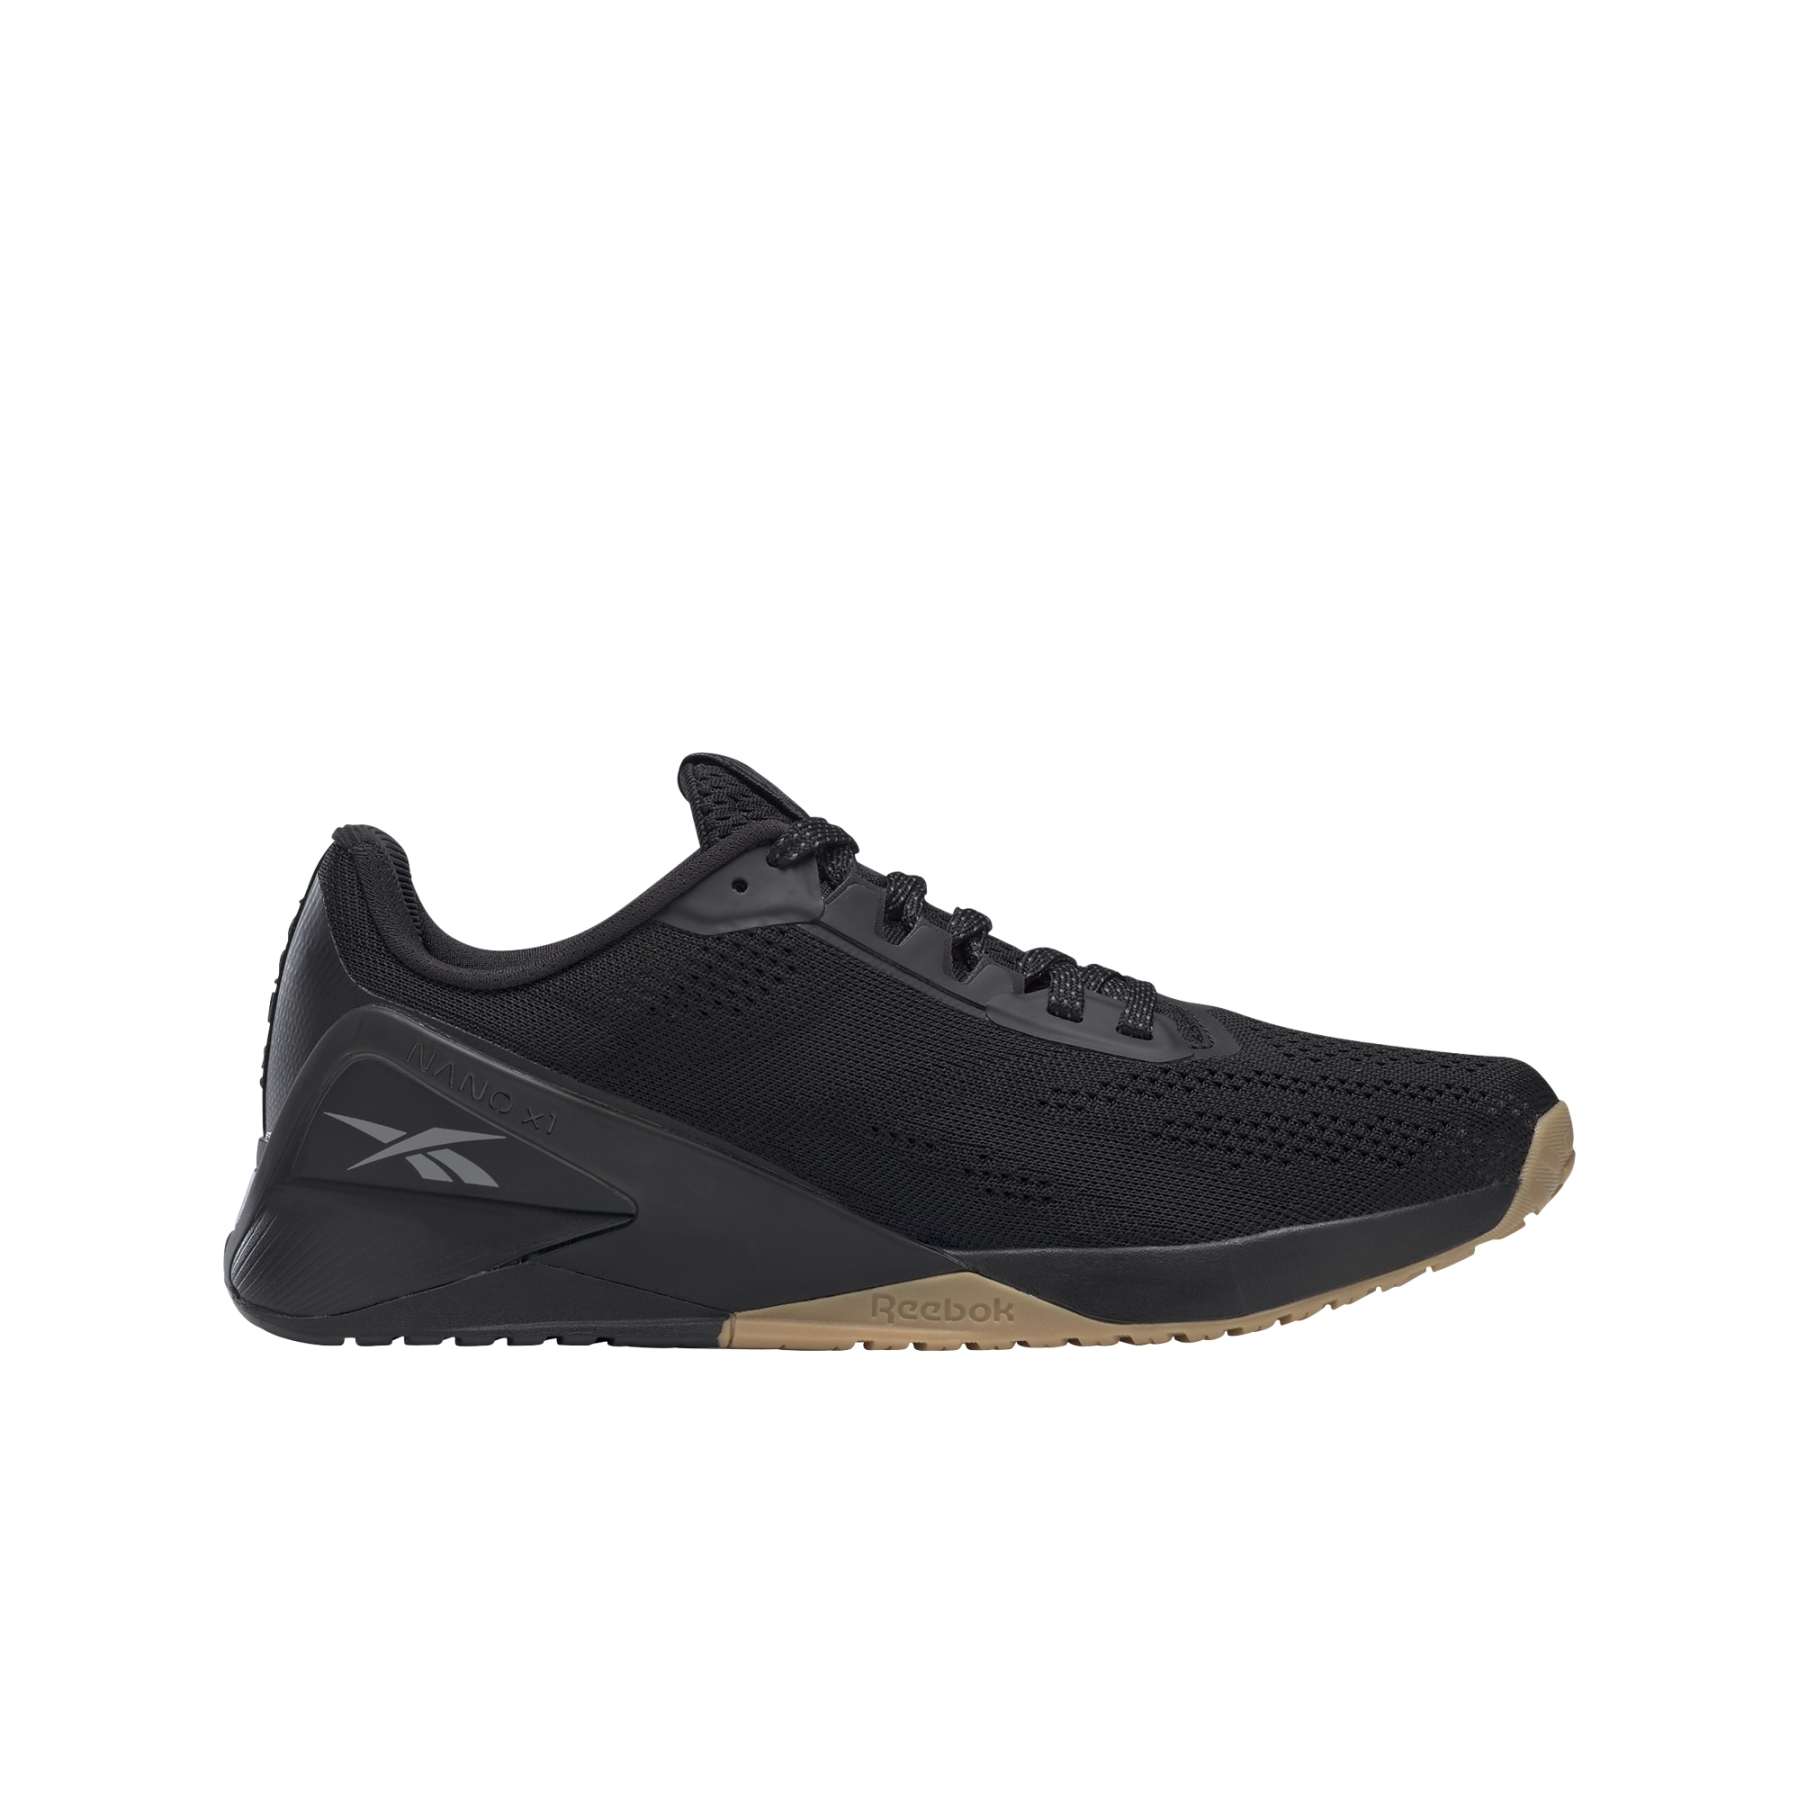 Reebok Nano X1 Herren-Fitnessschuh - black/night black/reebok rubber gum-01 FZ0633